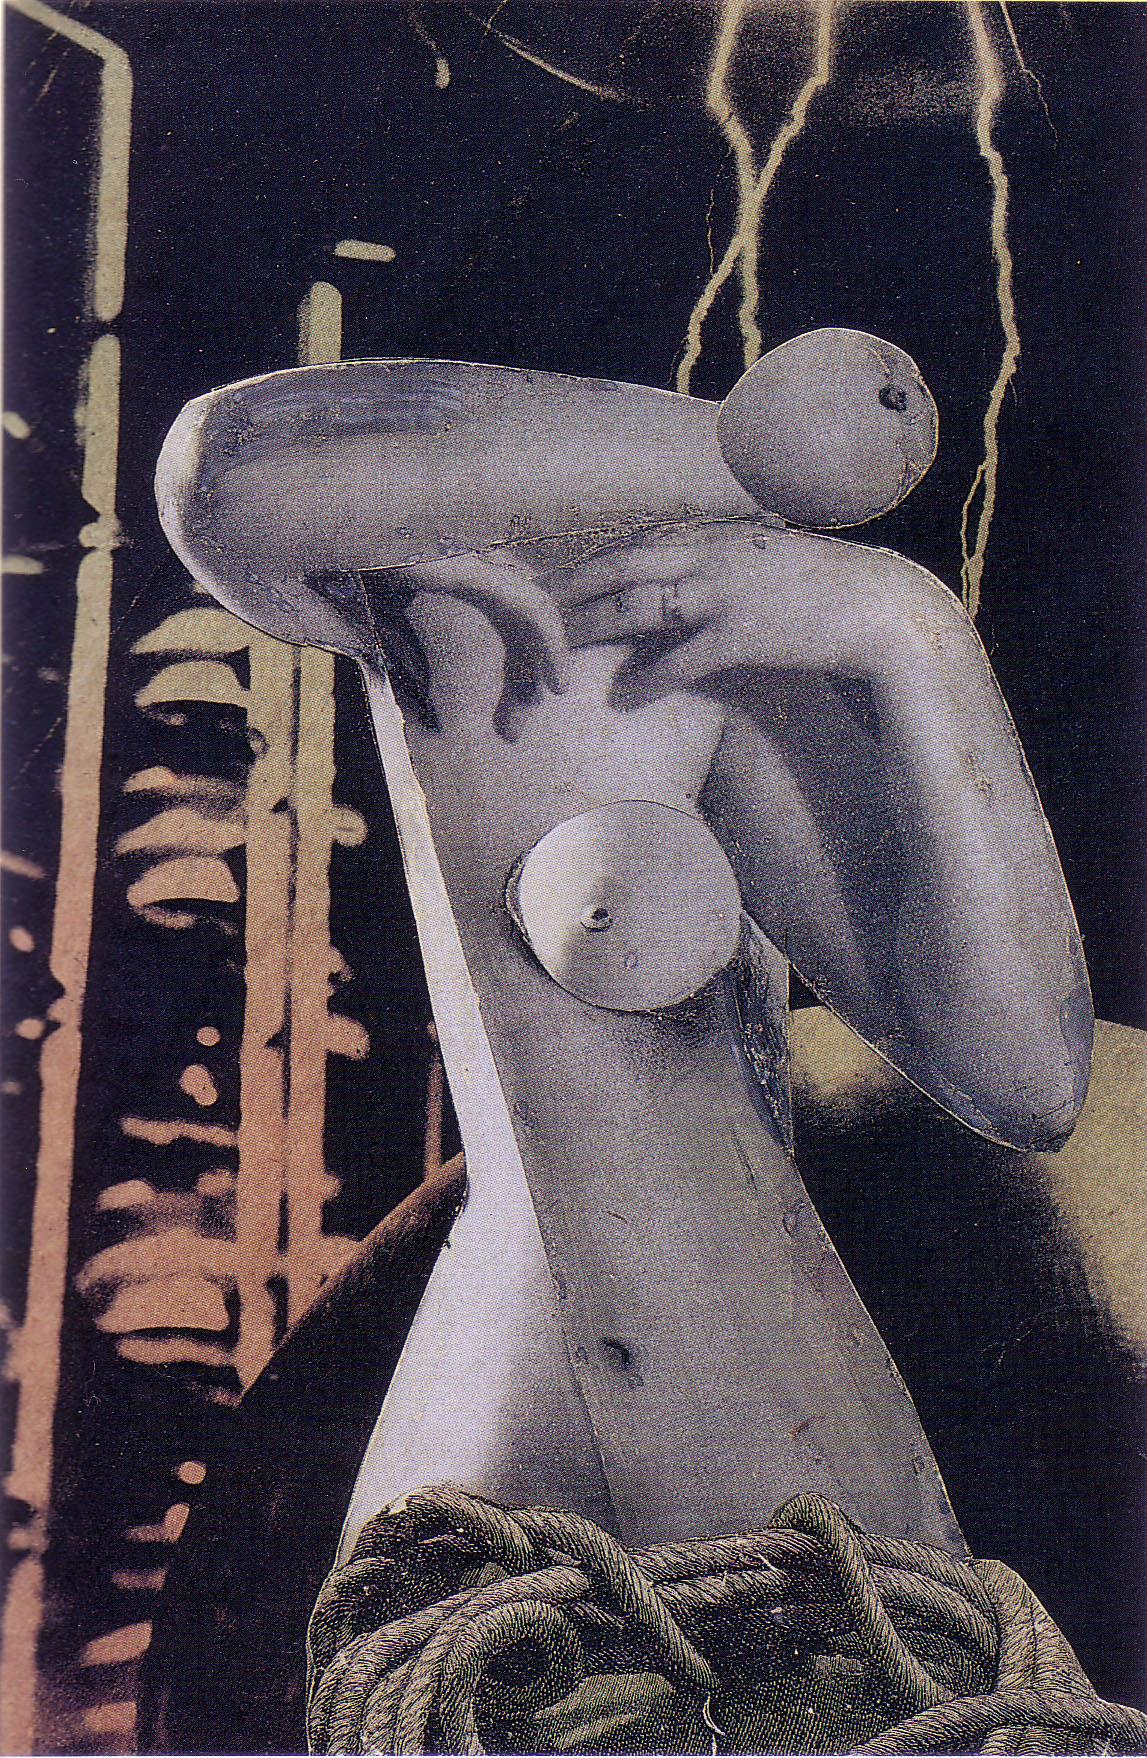 Karel Teige - Collage# 23, 1936 (c) Nachlass Karel Teige